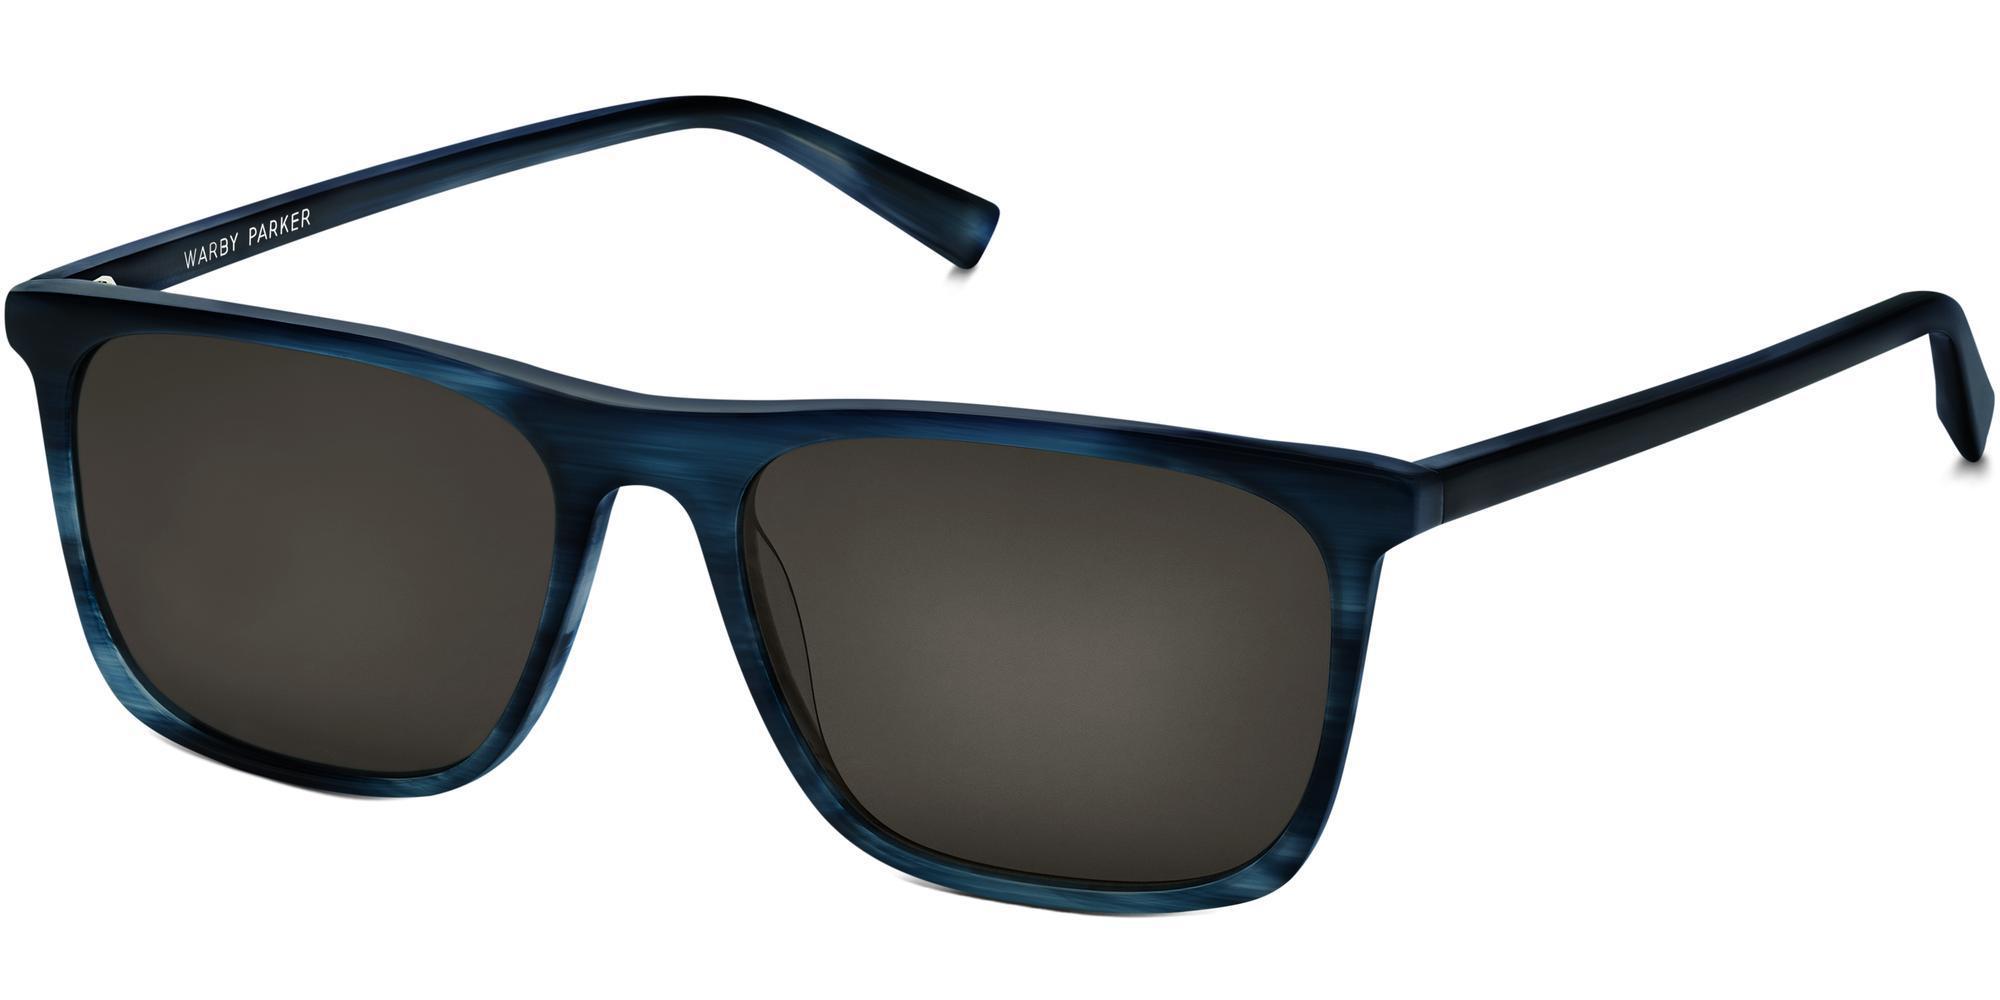 Lyst - Warby Parker Fletcher Sunglasses in Blue